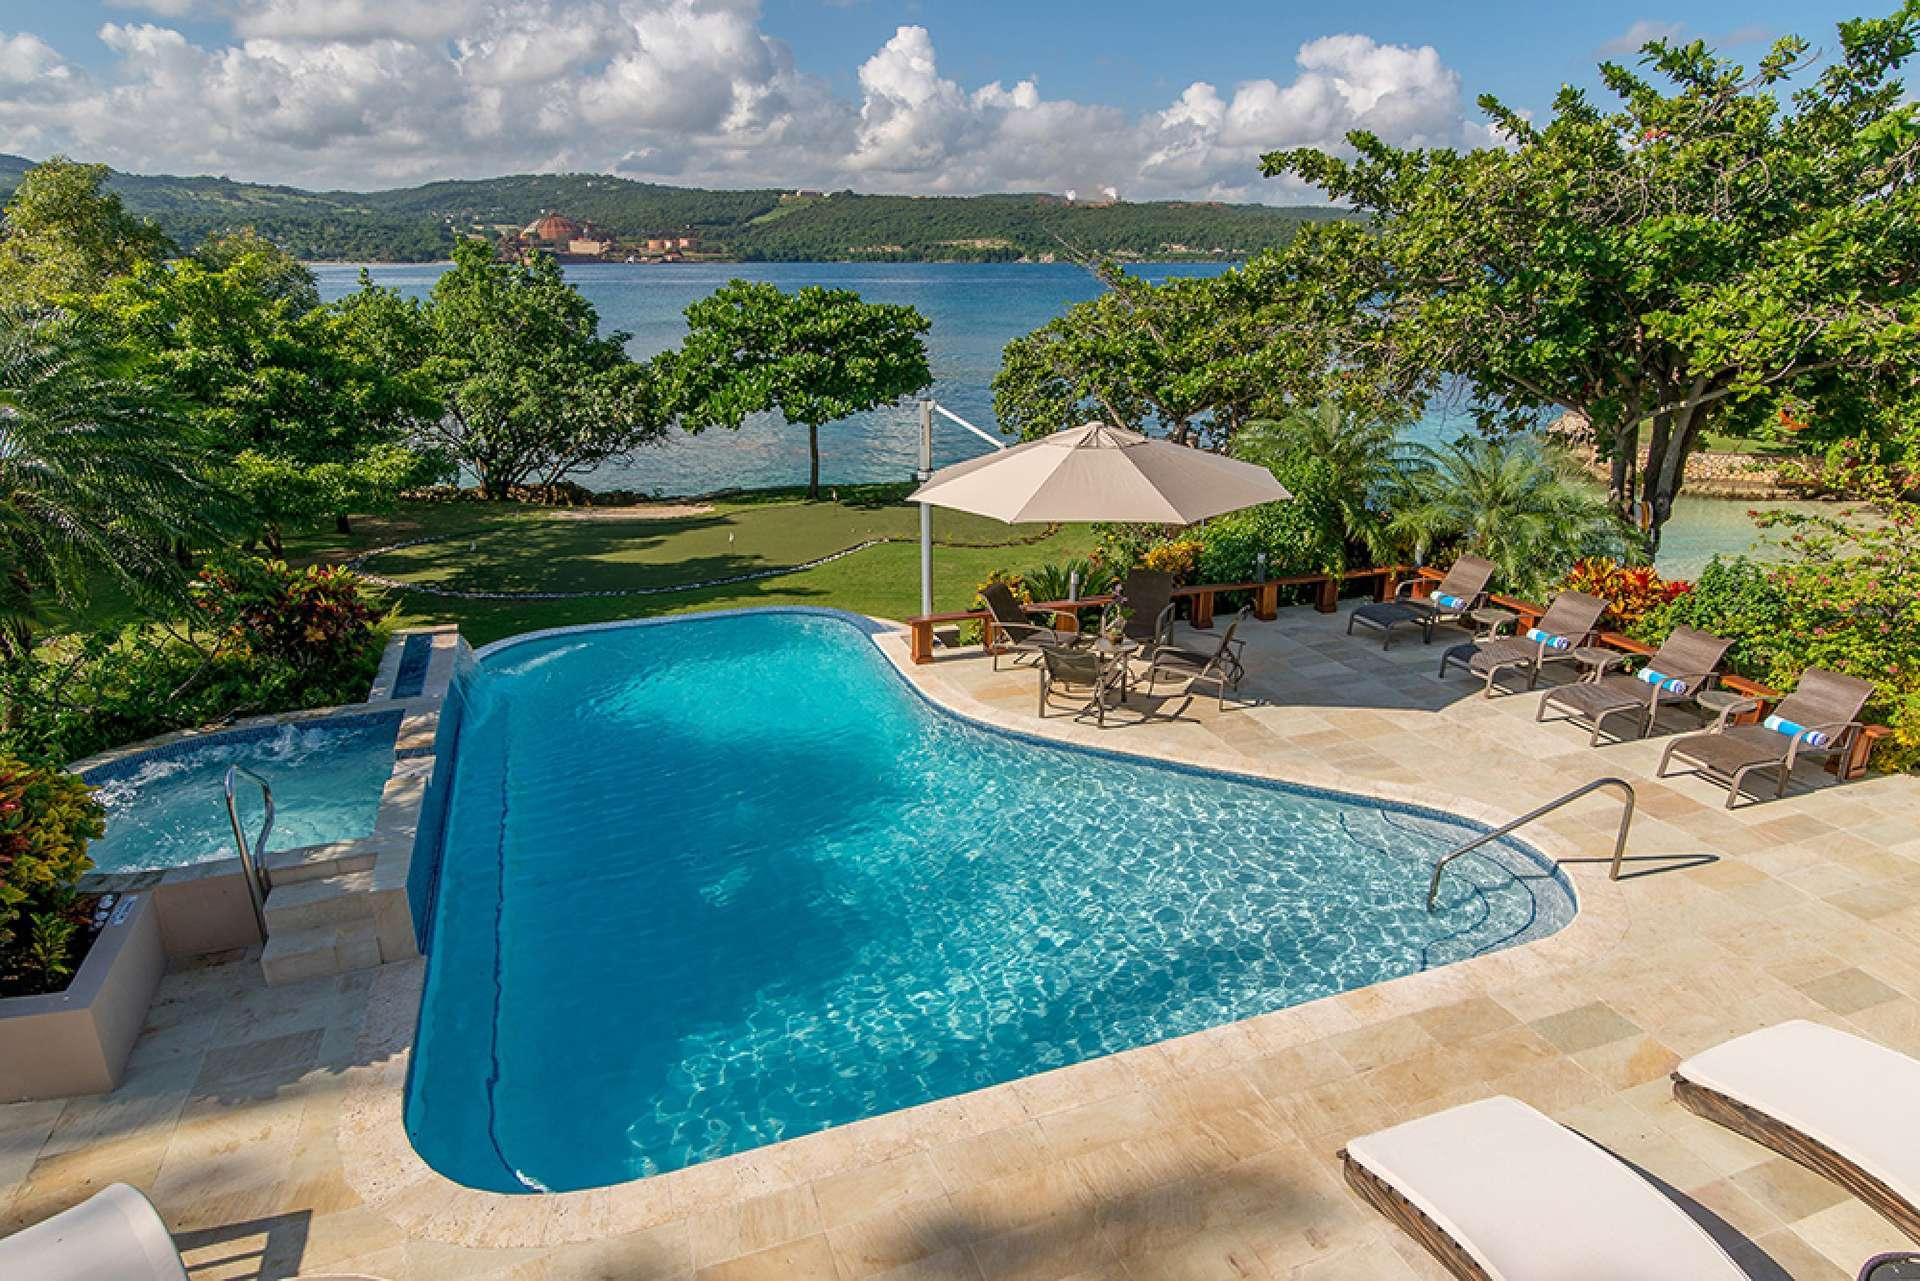 Luxury villa rentals caribbean - Jamaica - Discovery bay - No location 4 - Fortlands Point - Image 1/33